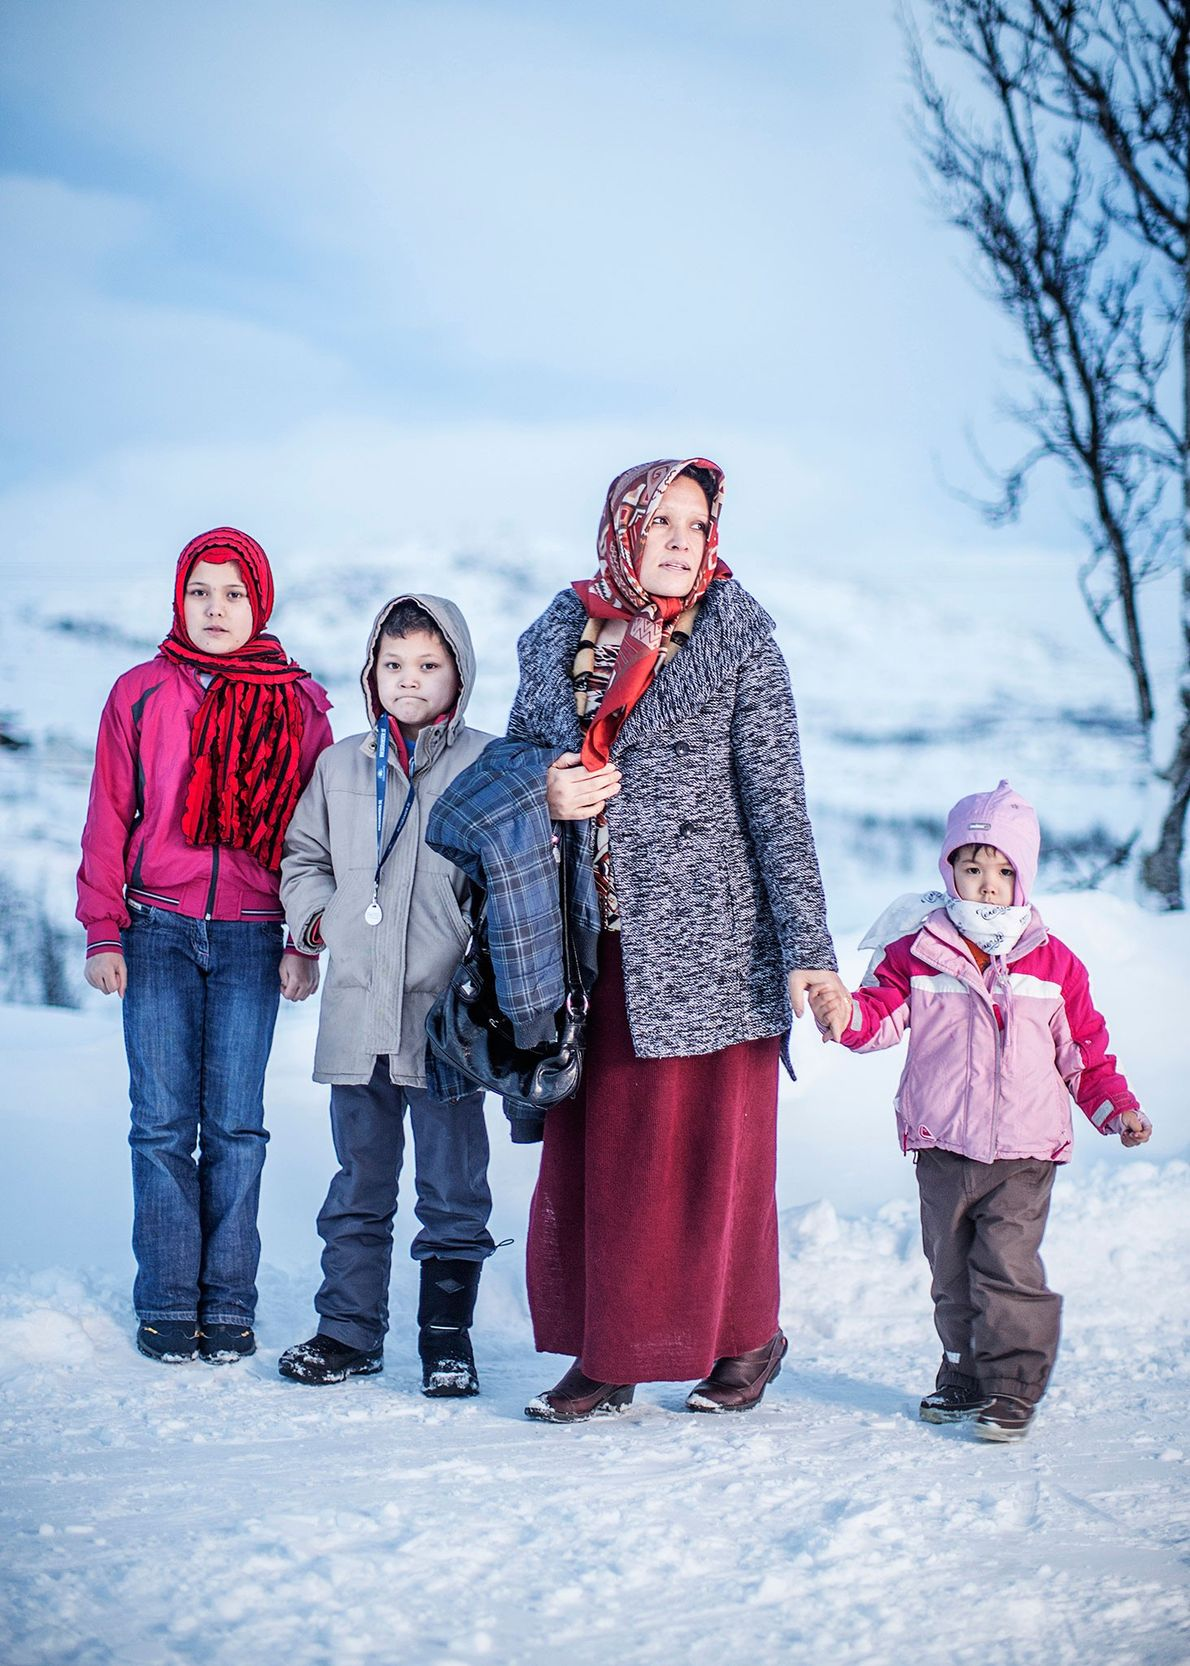 Fotografia de Adila Mohsini com os seus filhos